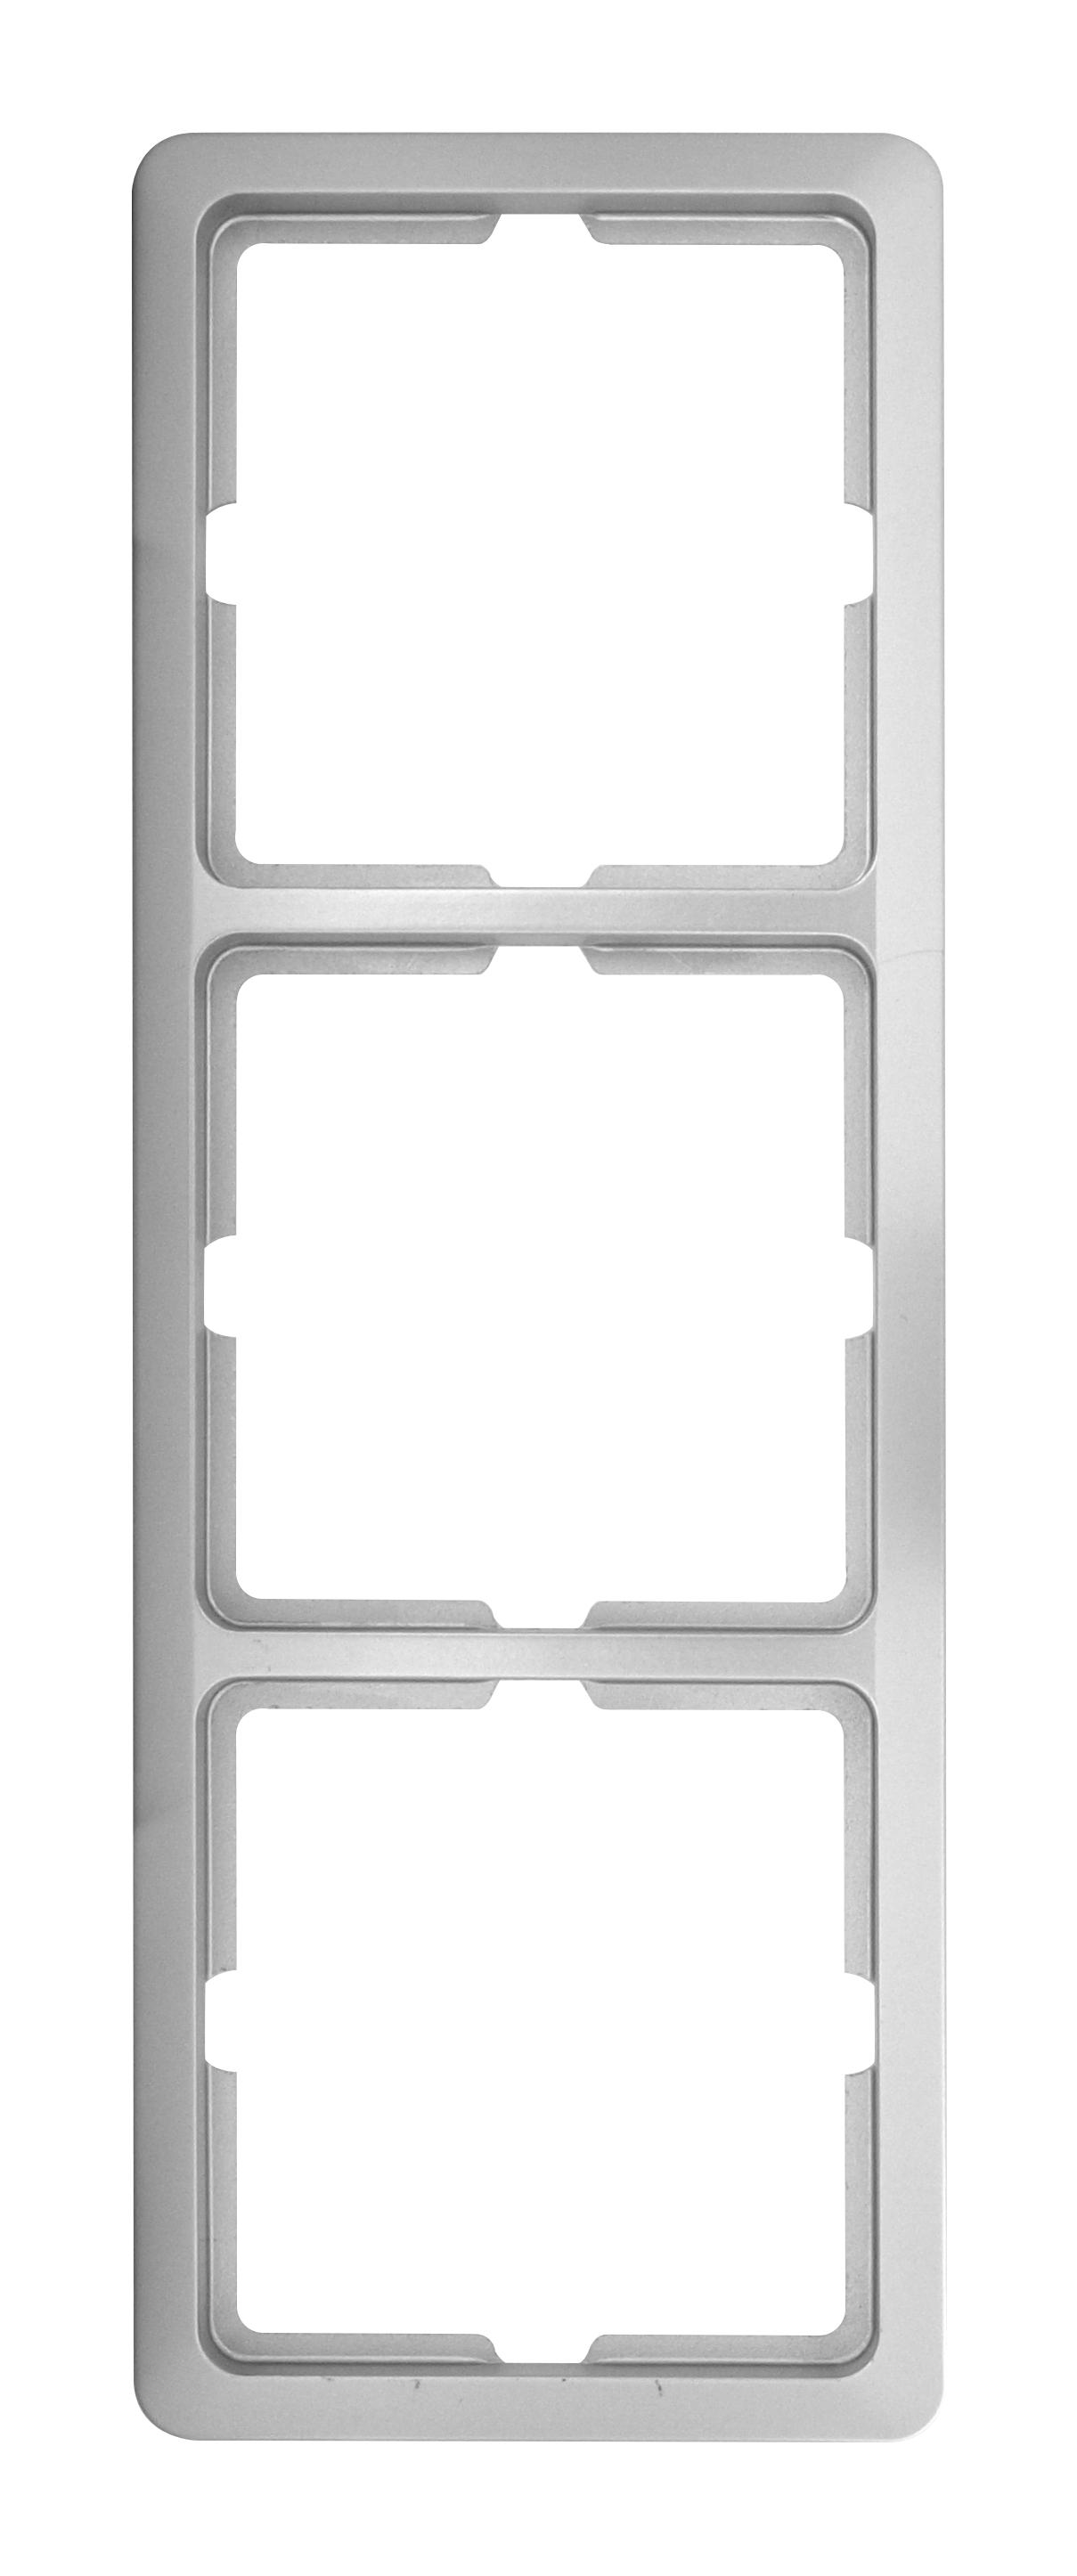 1 Stk Rahmen 3-fach, Edelstahleffekt Scala EL2043111-